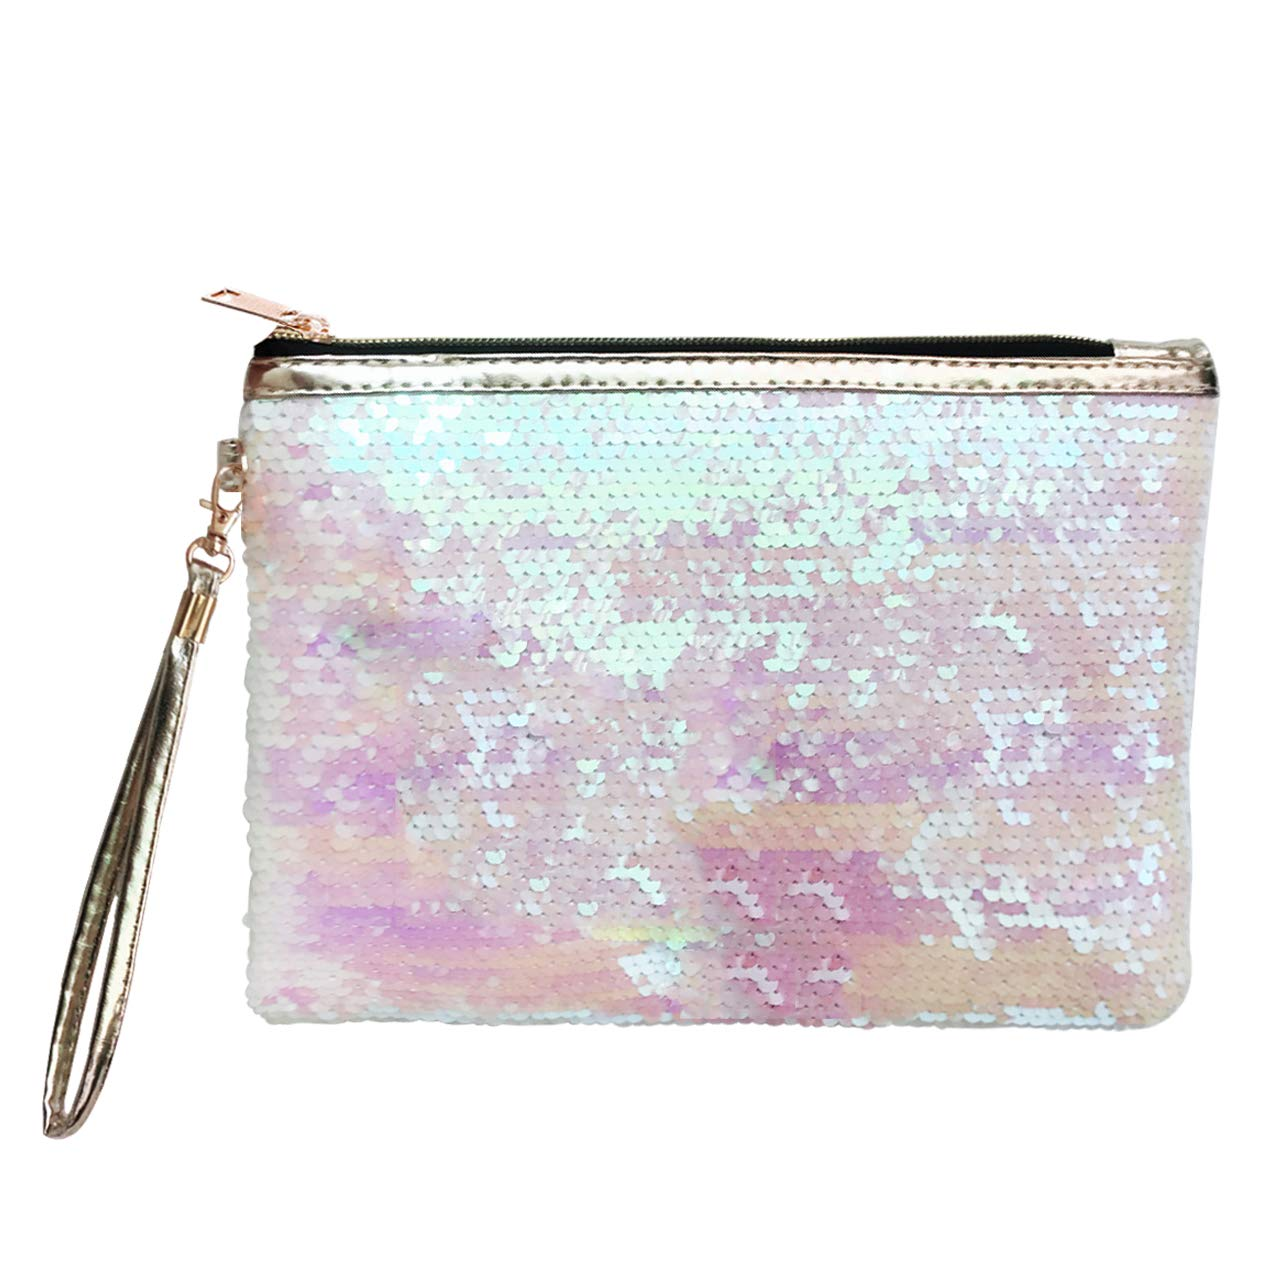 CCbeauty Makeup Bag Reversible Cosmetic Bag Fashion Women Handbag Bling Glitter Sparkling Shiny Clutch Purse Wallet Pouch (Pink+White)